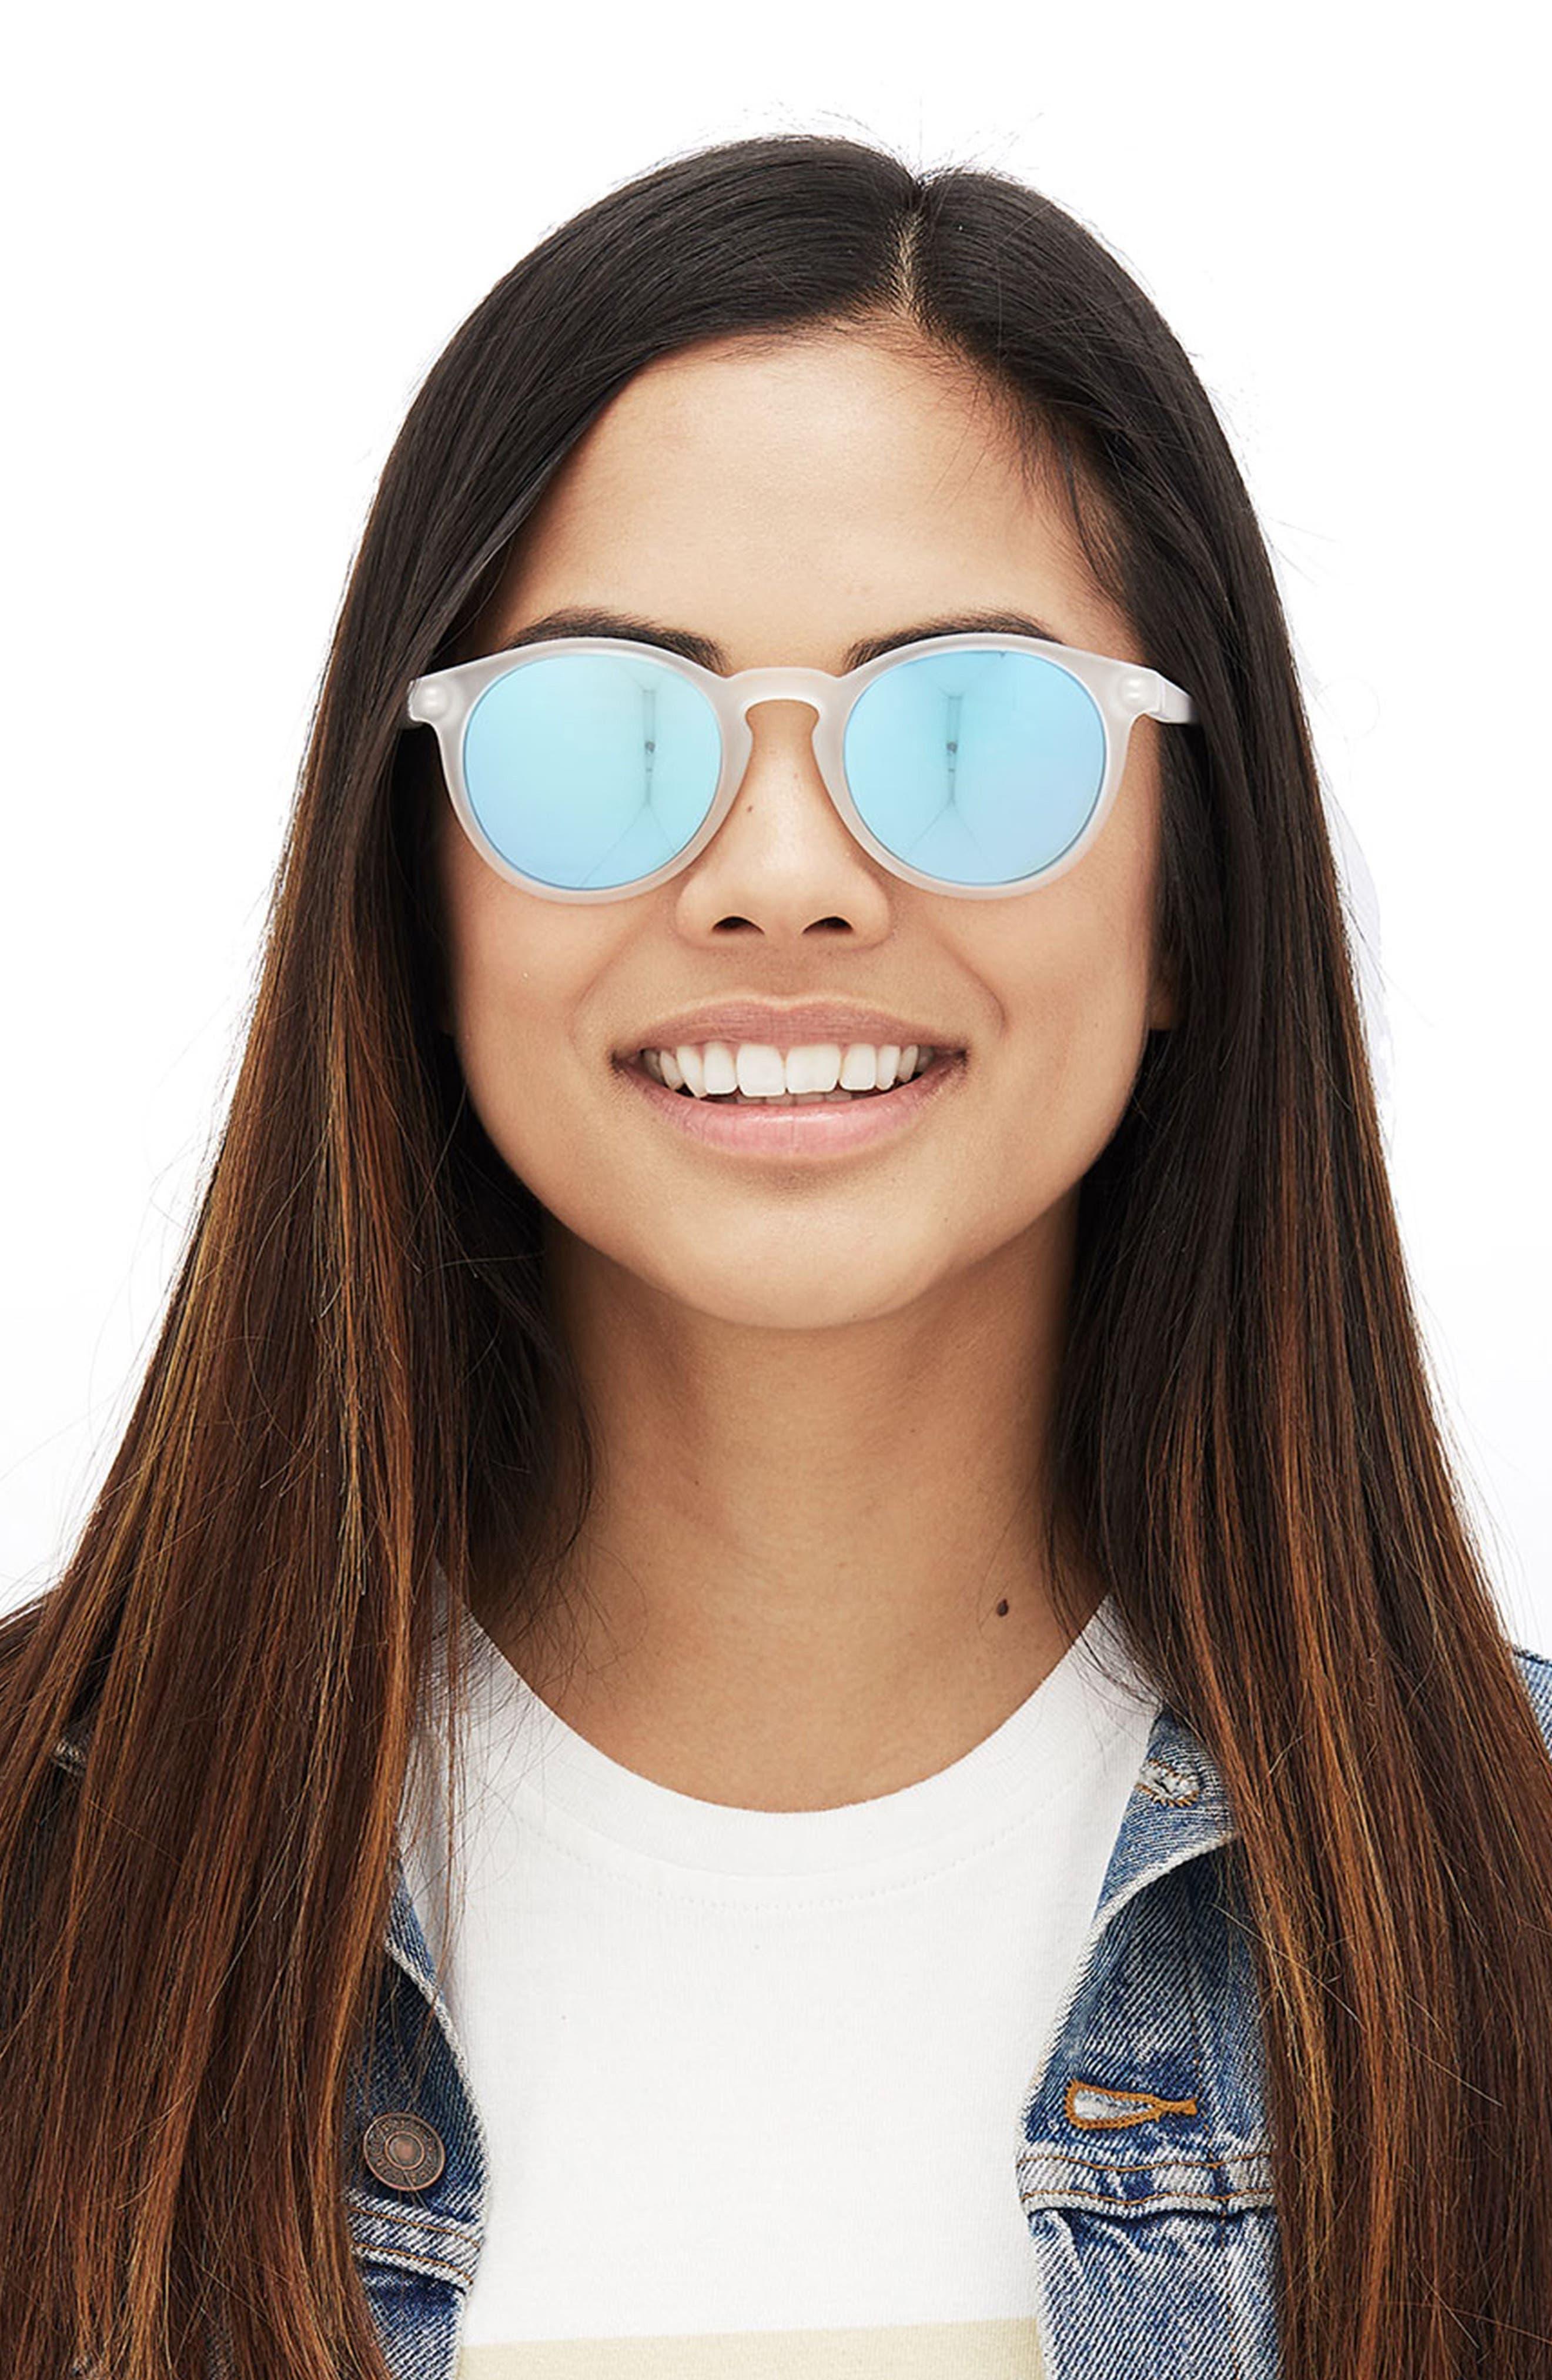 Dipsea 48mm Polarized Sunglasses,                             Alternate thumbnail 8, color,                             TORTOISE EMERALD